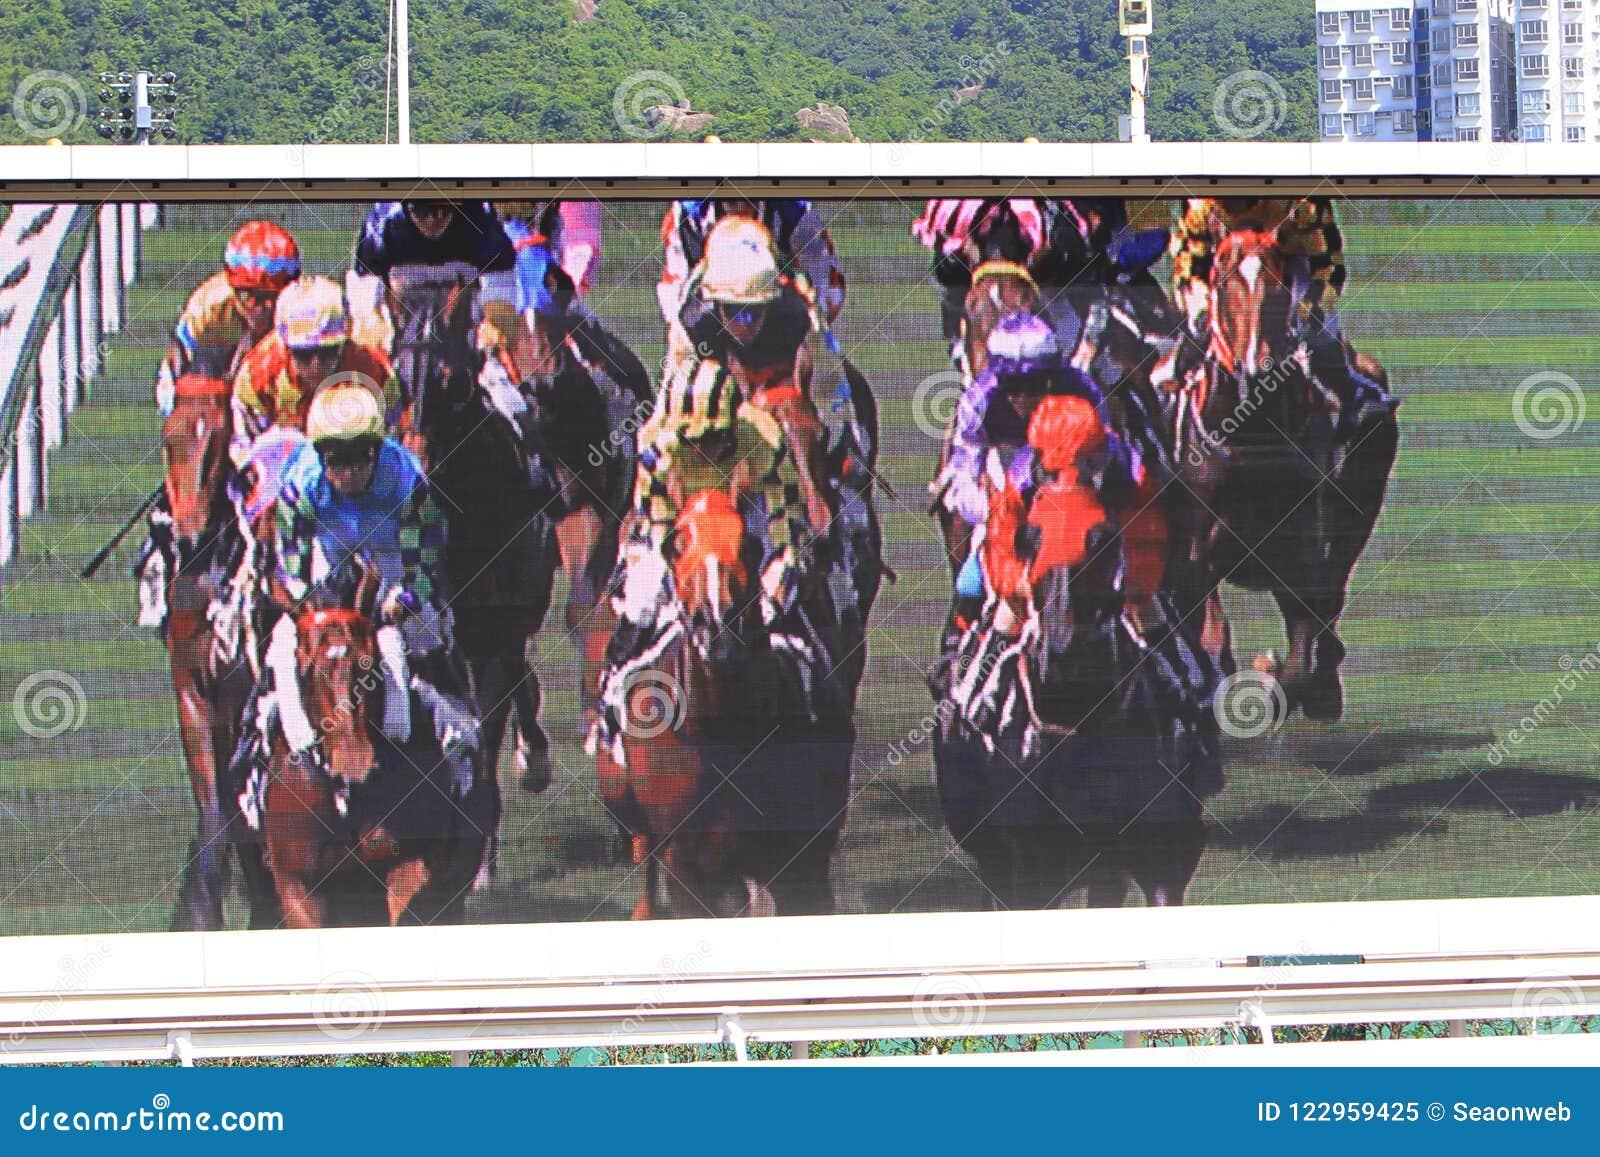 Gambling Racecourse